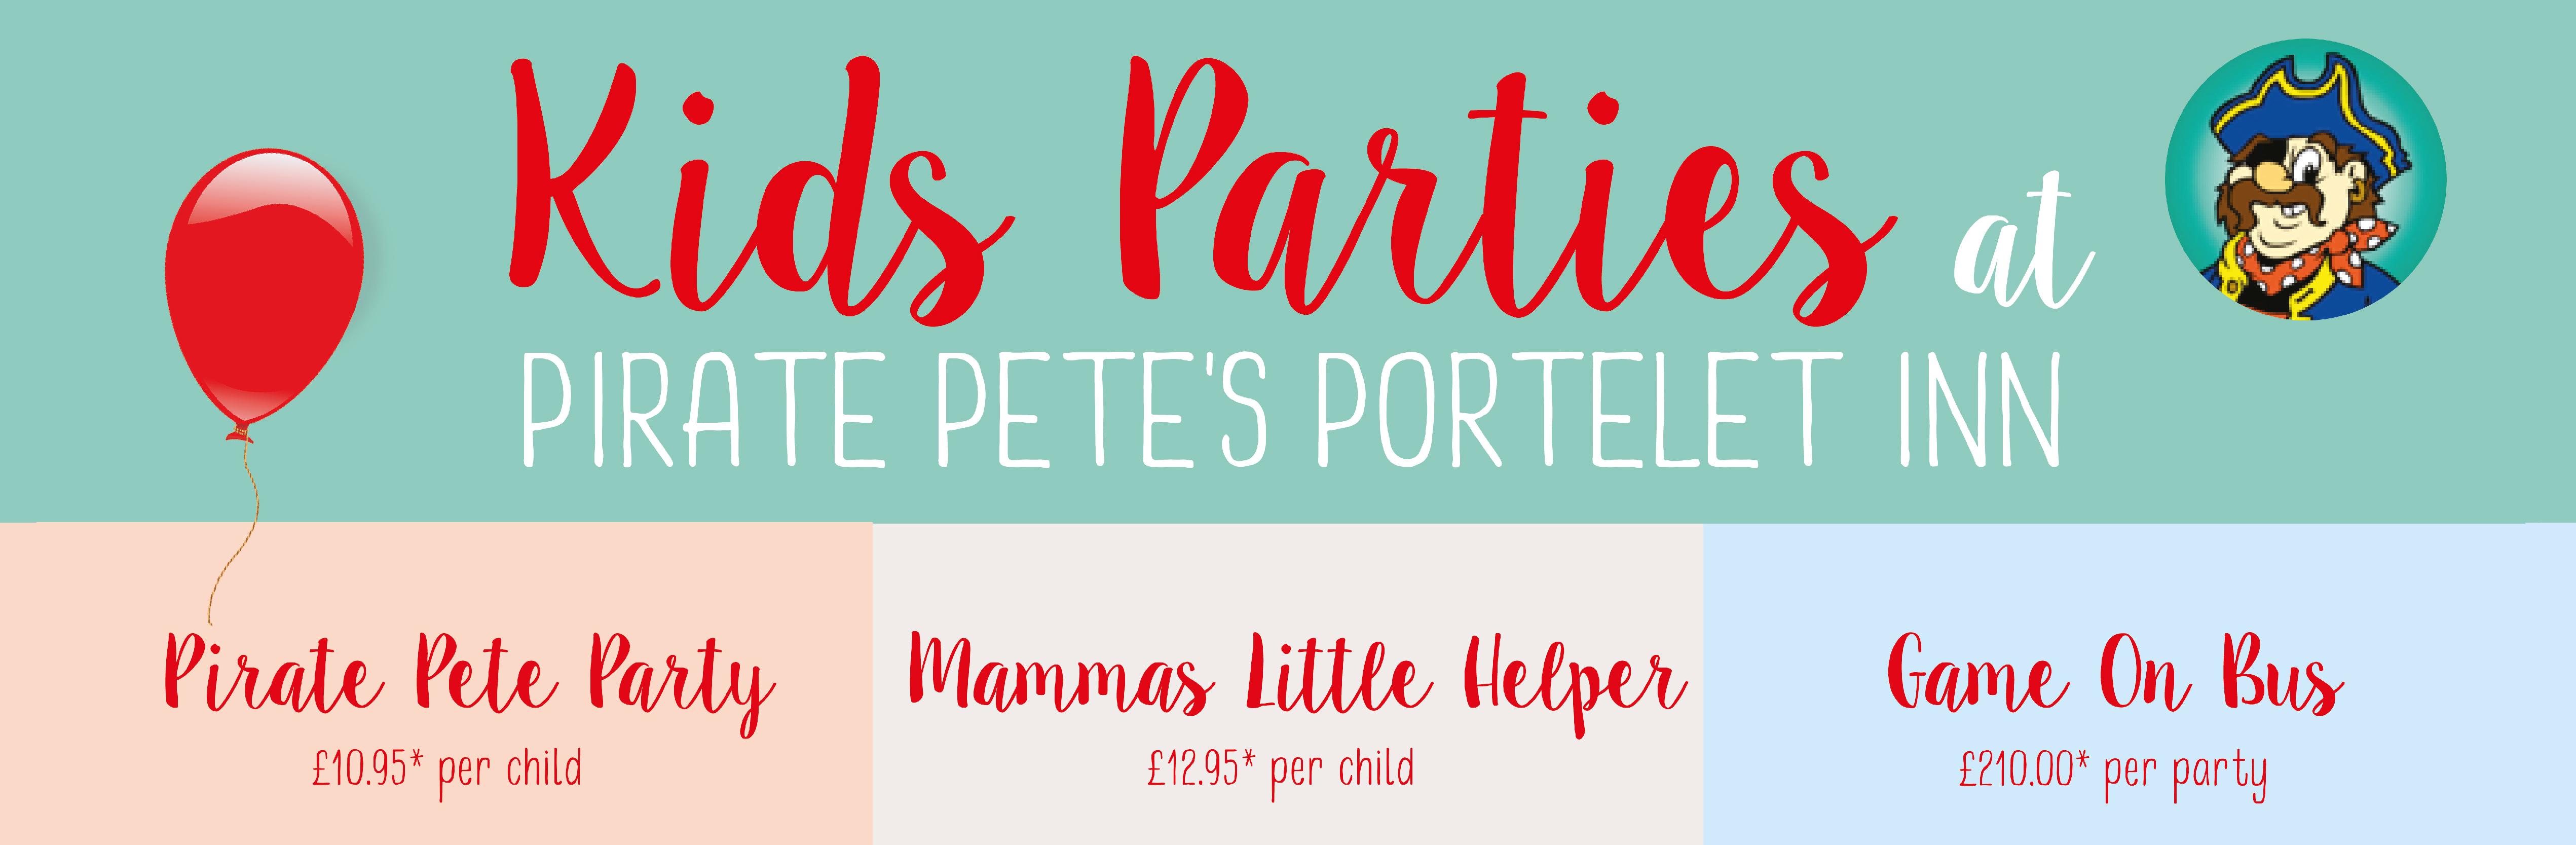 Pirate Pete's Kids Parties